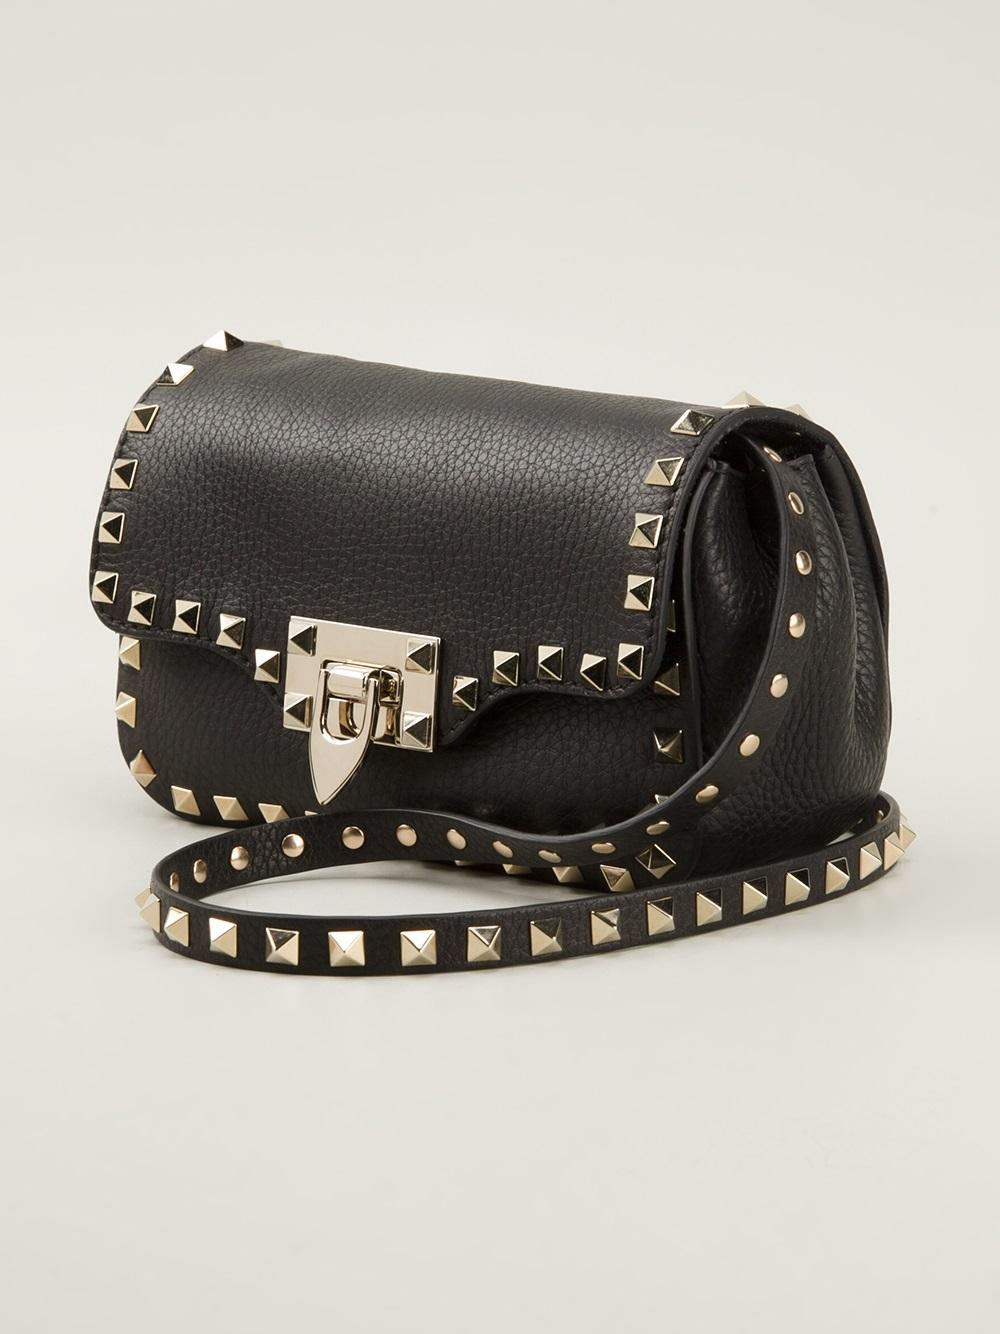 Chloe Black Bag Valentino Rockstud Cross Body Bag in Black | Lyst